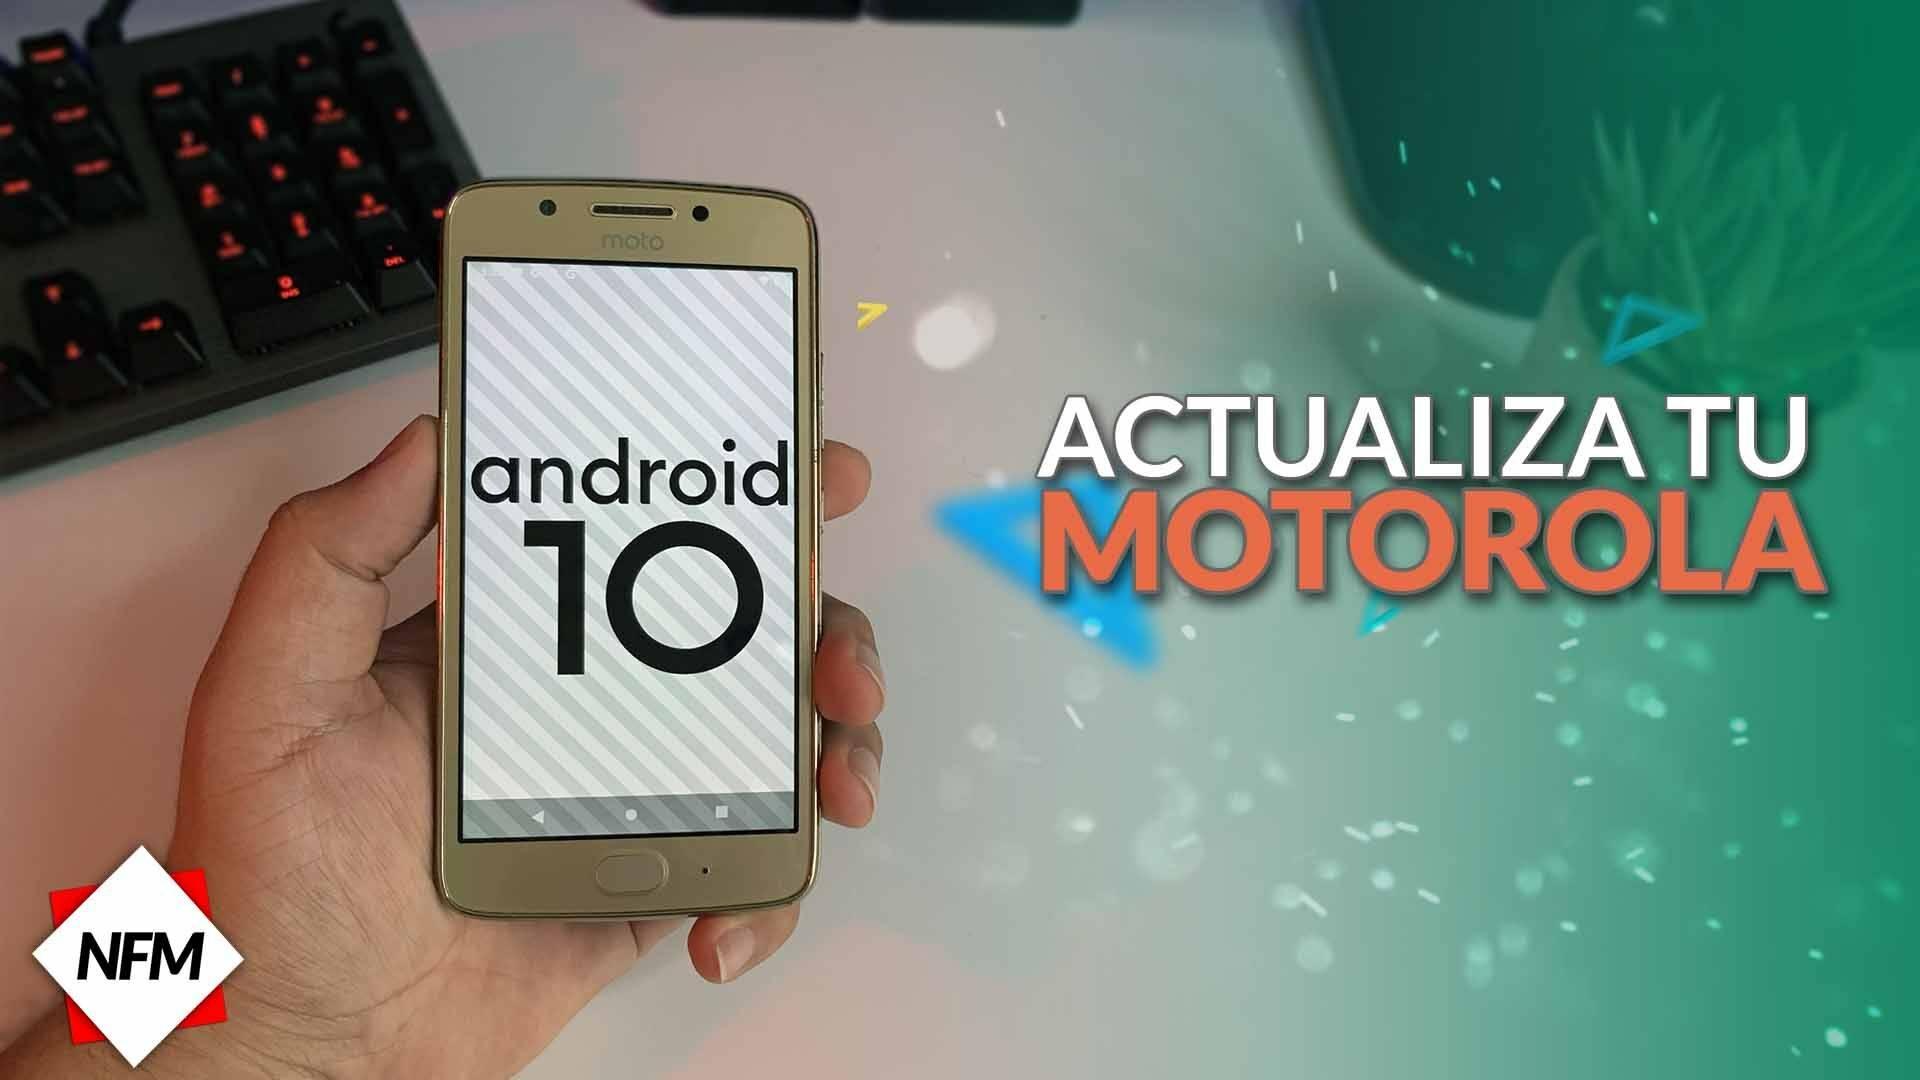 Como Actualizar mi Motorola G5/G5S/PLUS a Android 10 5